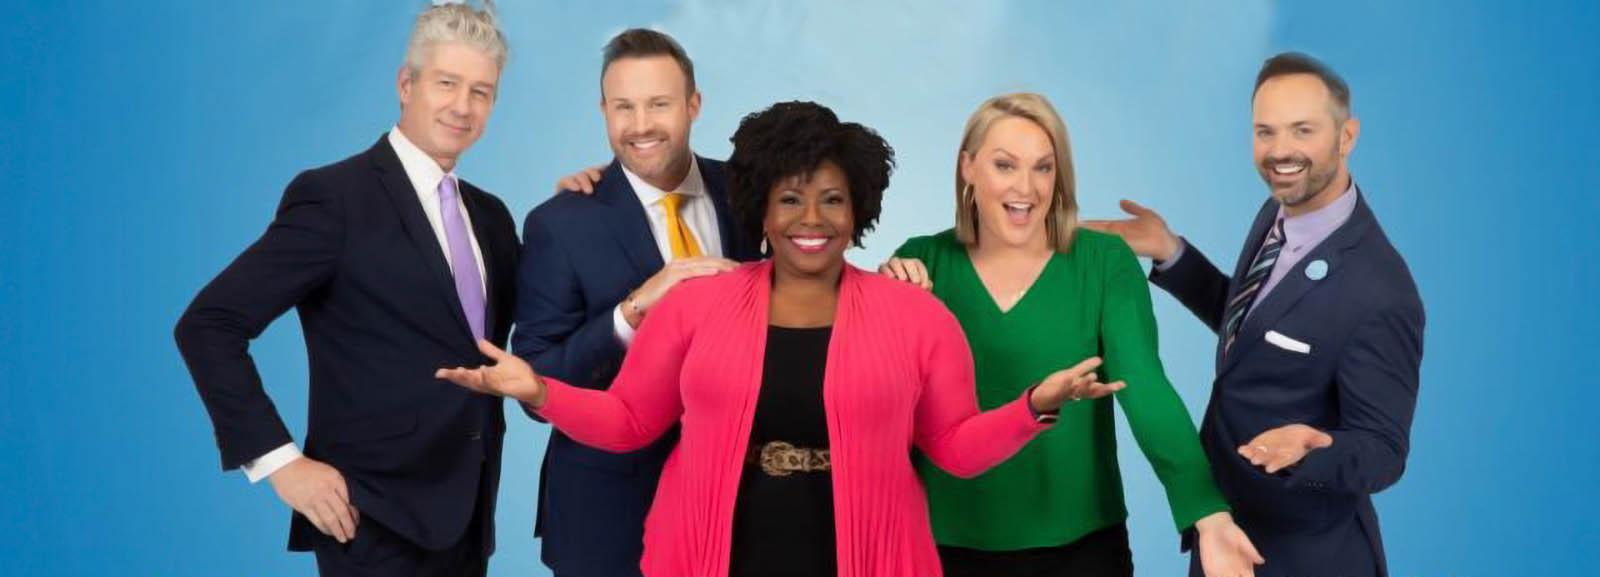 Fox 46 News Charlotte Newscasters